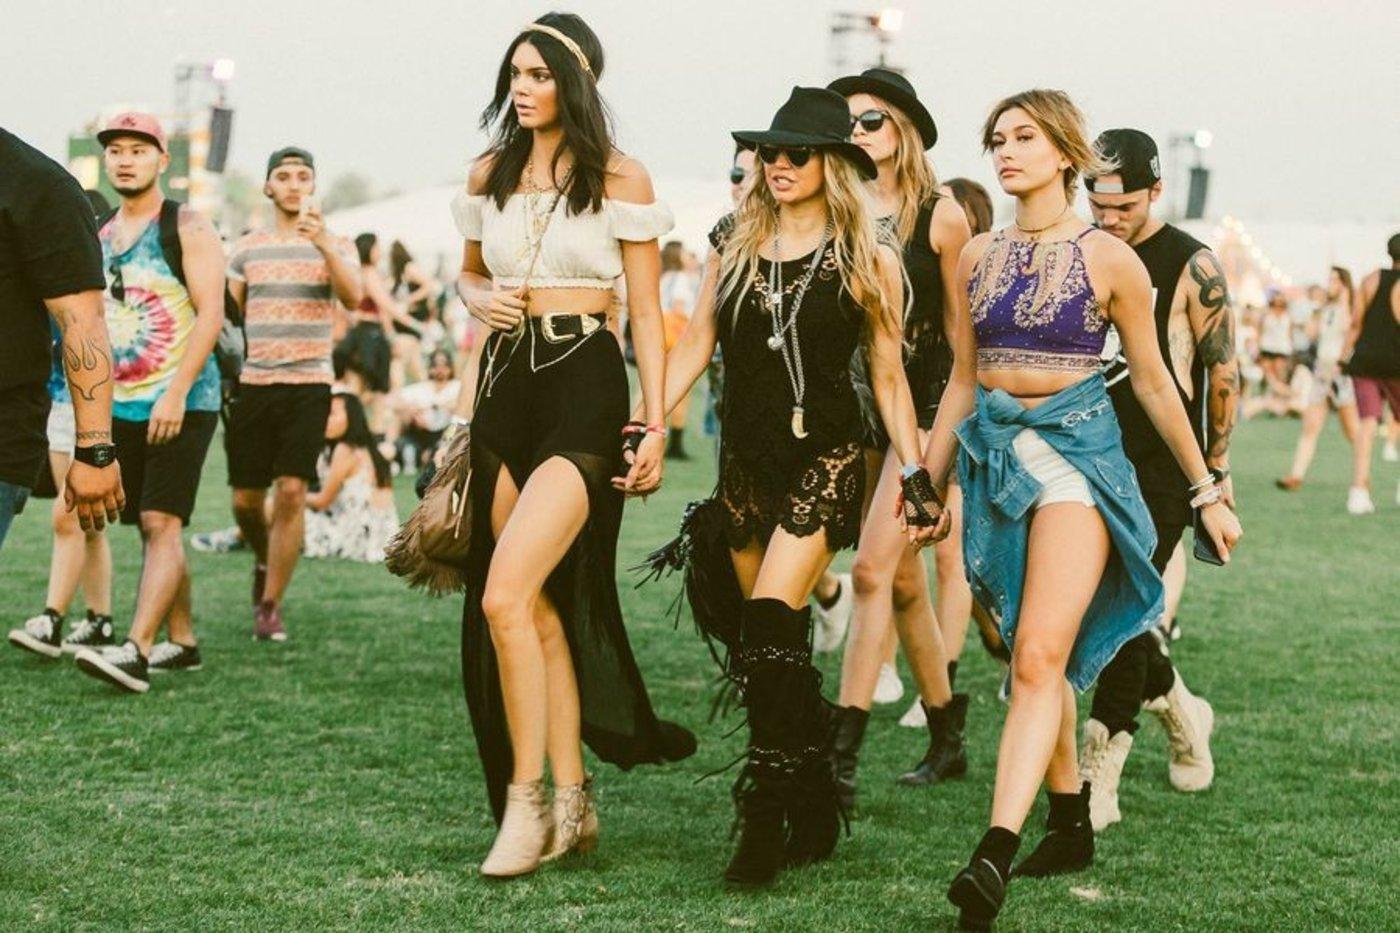 Kendall Jenner等人在音乐节上。图片来源/themomedit.com